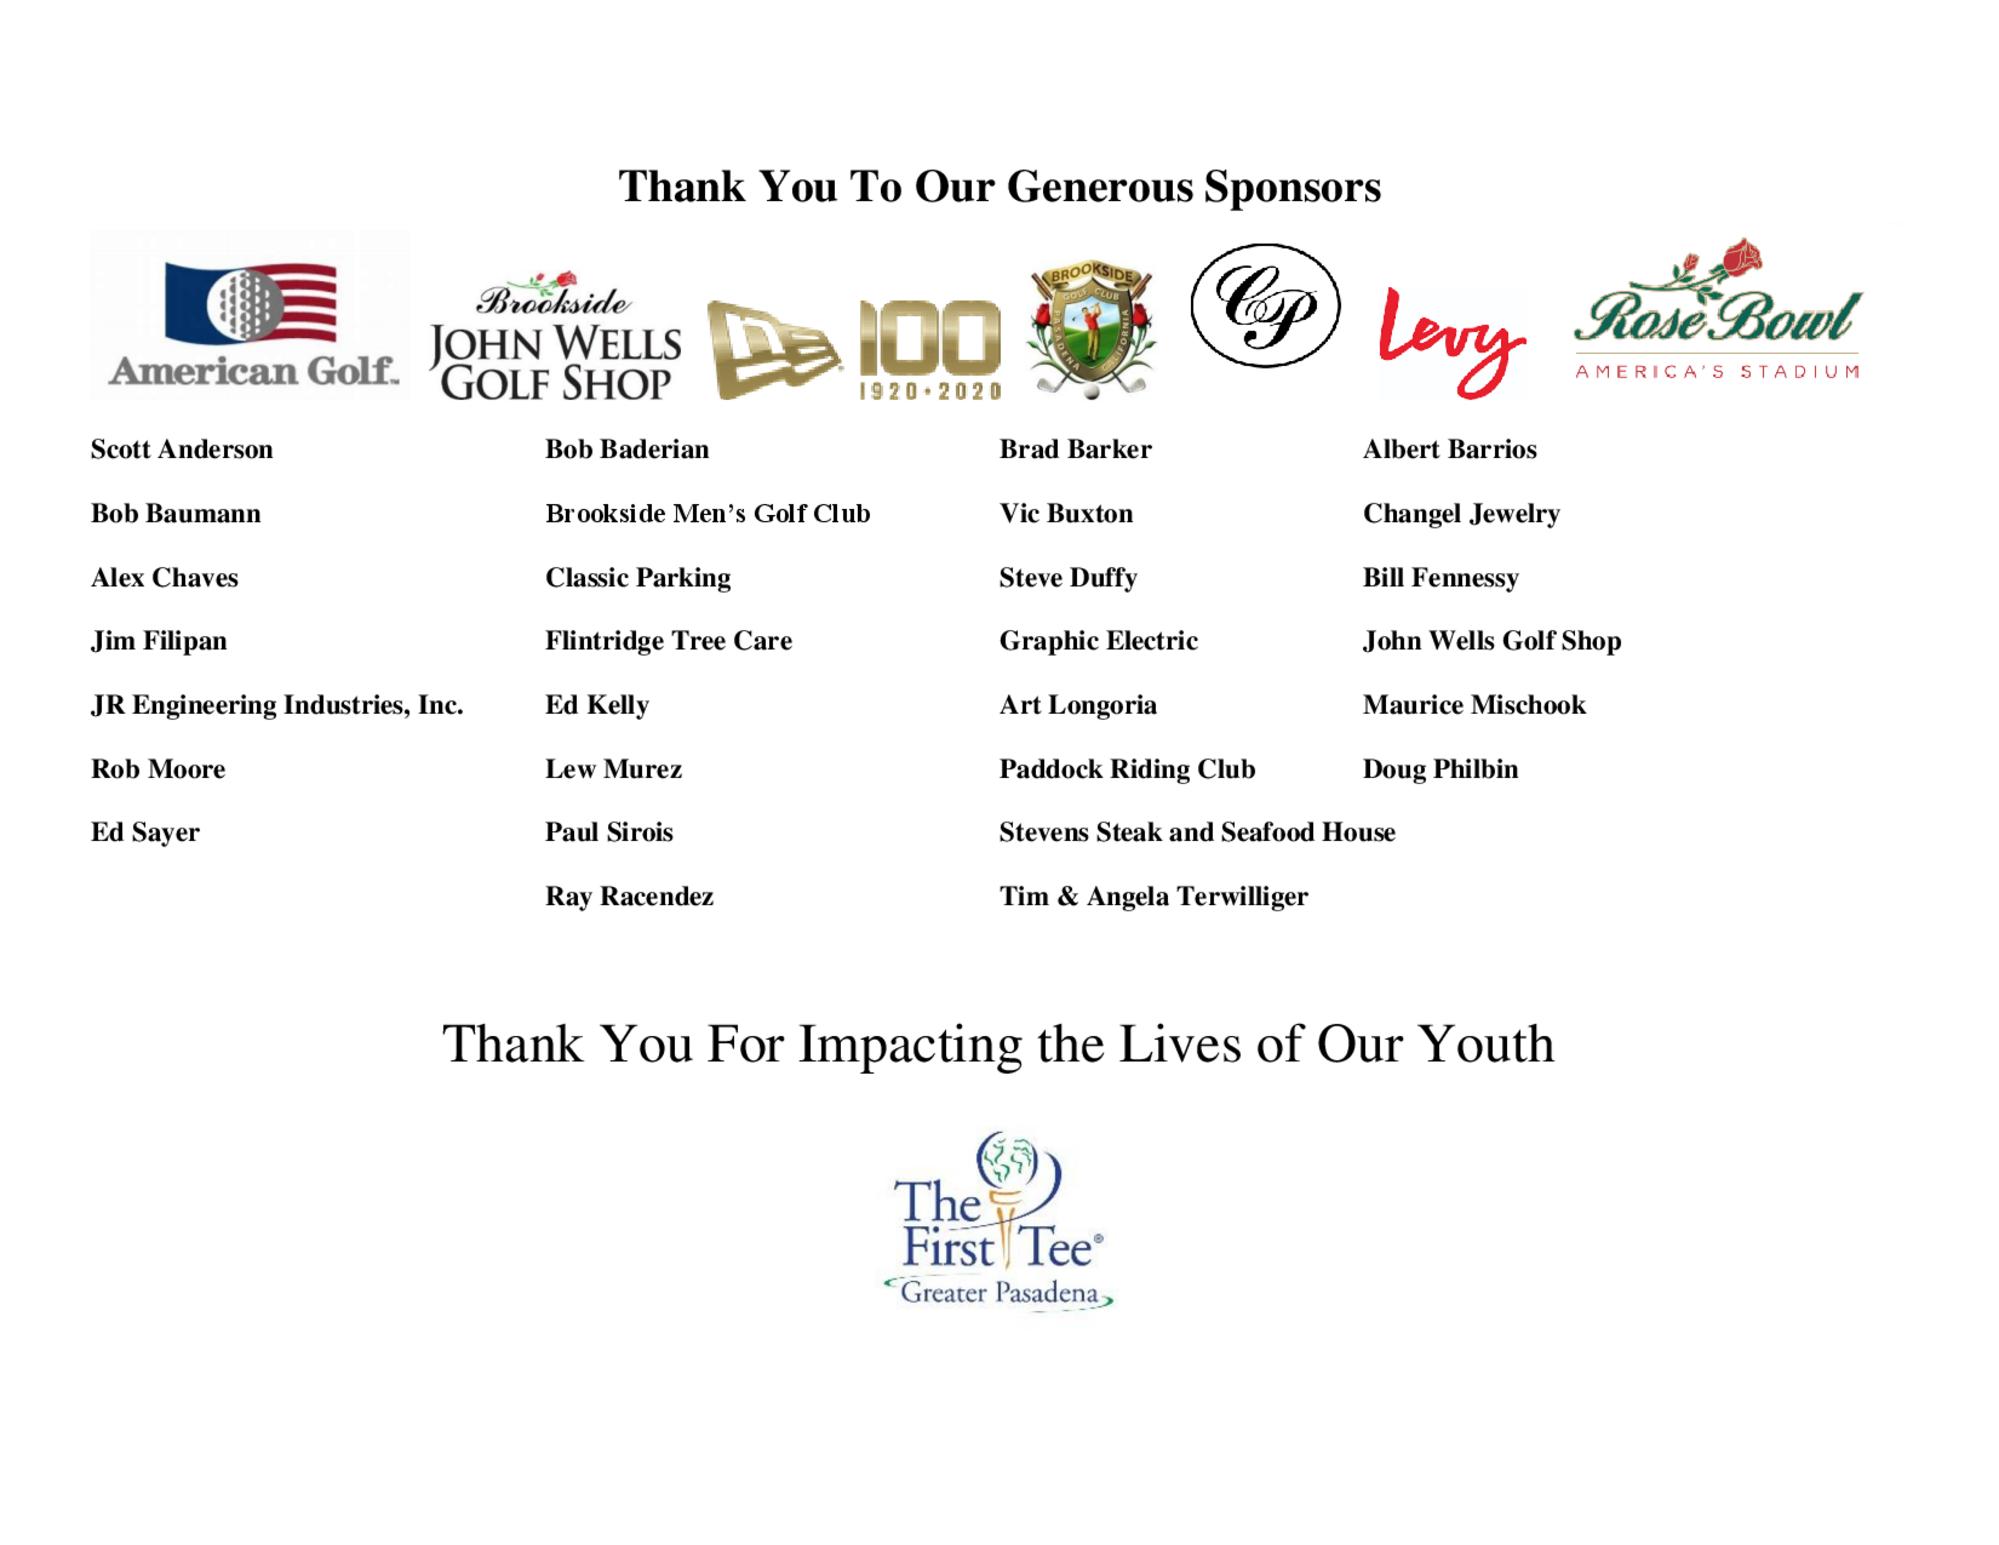 Pasadena city sponsors 1